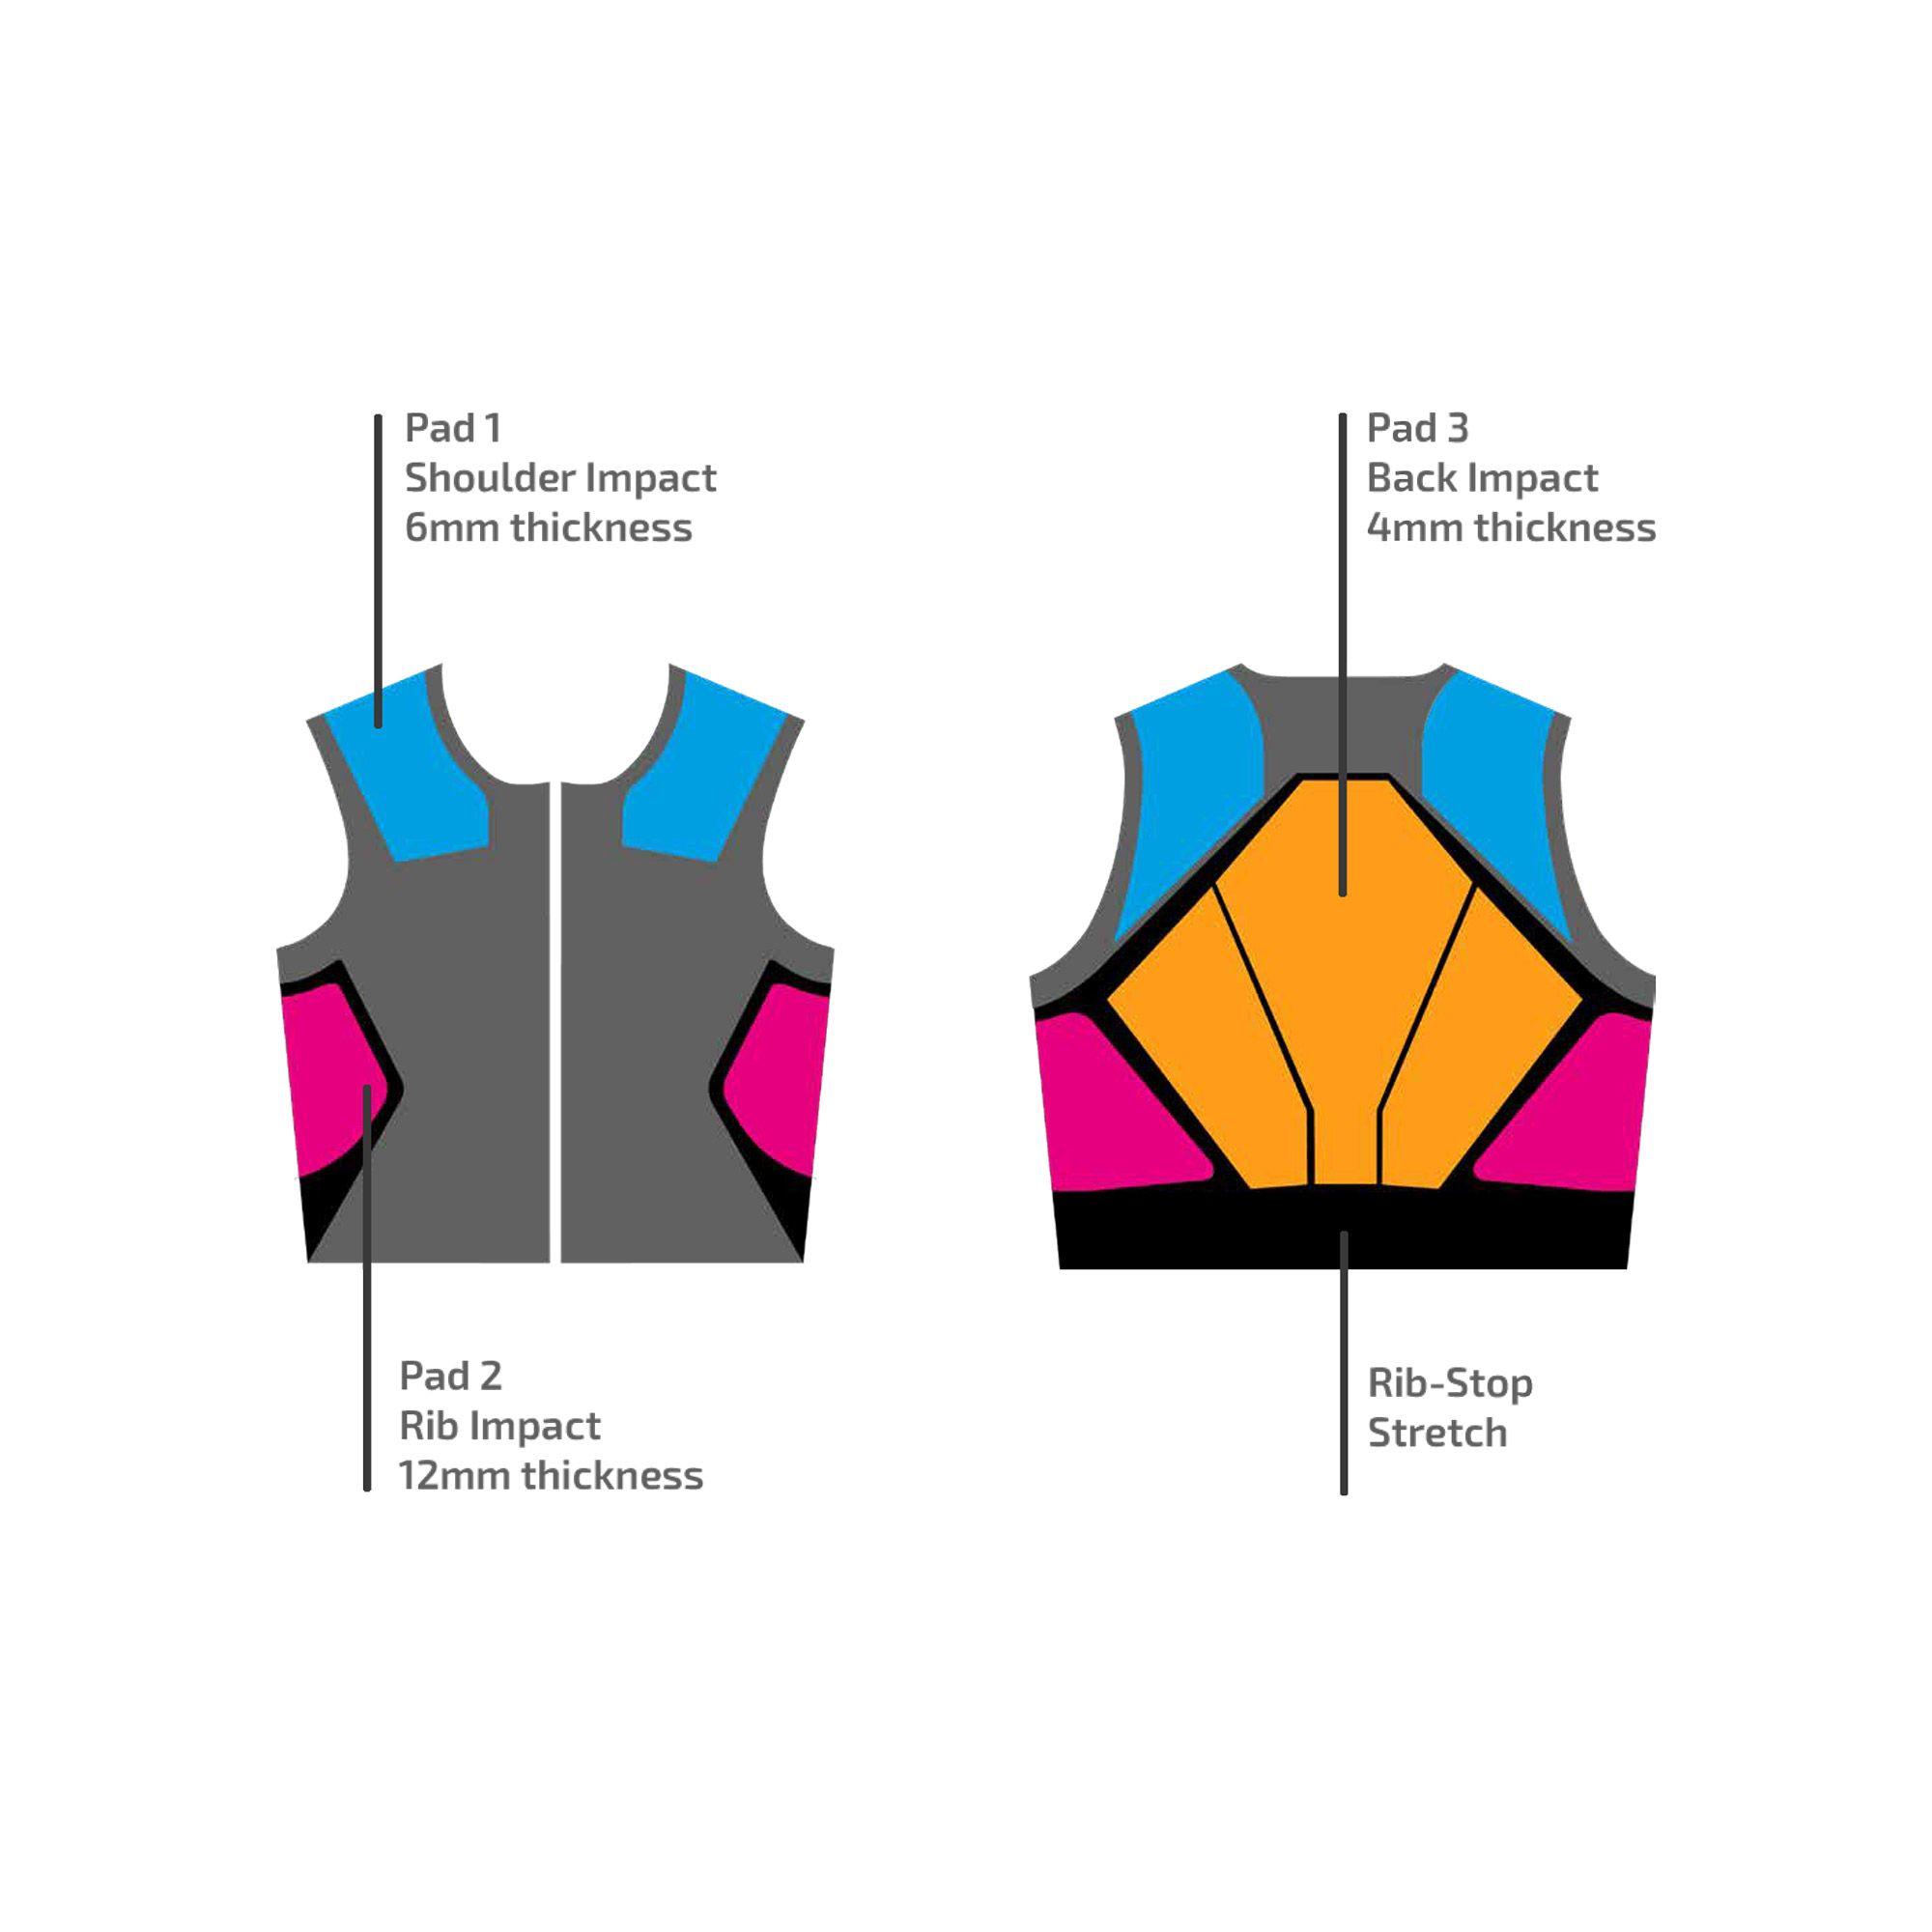 002402K-Sparco-SJ-PRO-K3-Karting-Kart-Protection-Vest-Jacket-Rib-Protector thumbnail 13